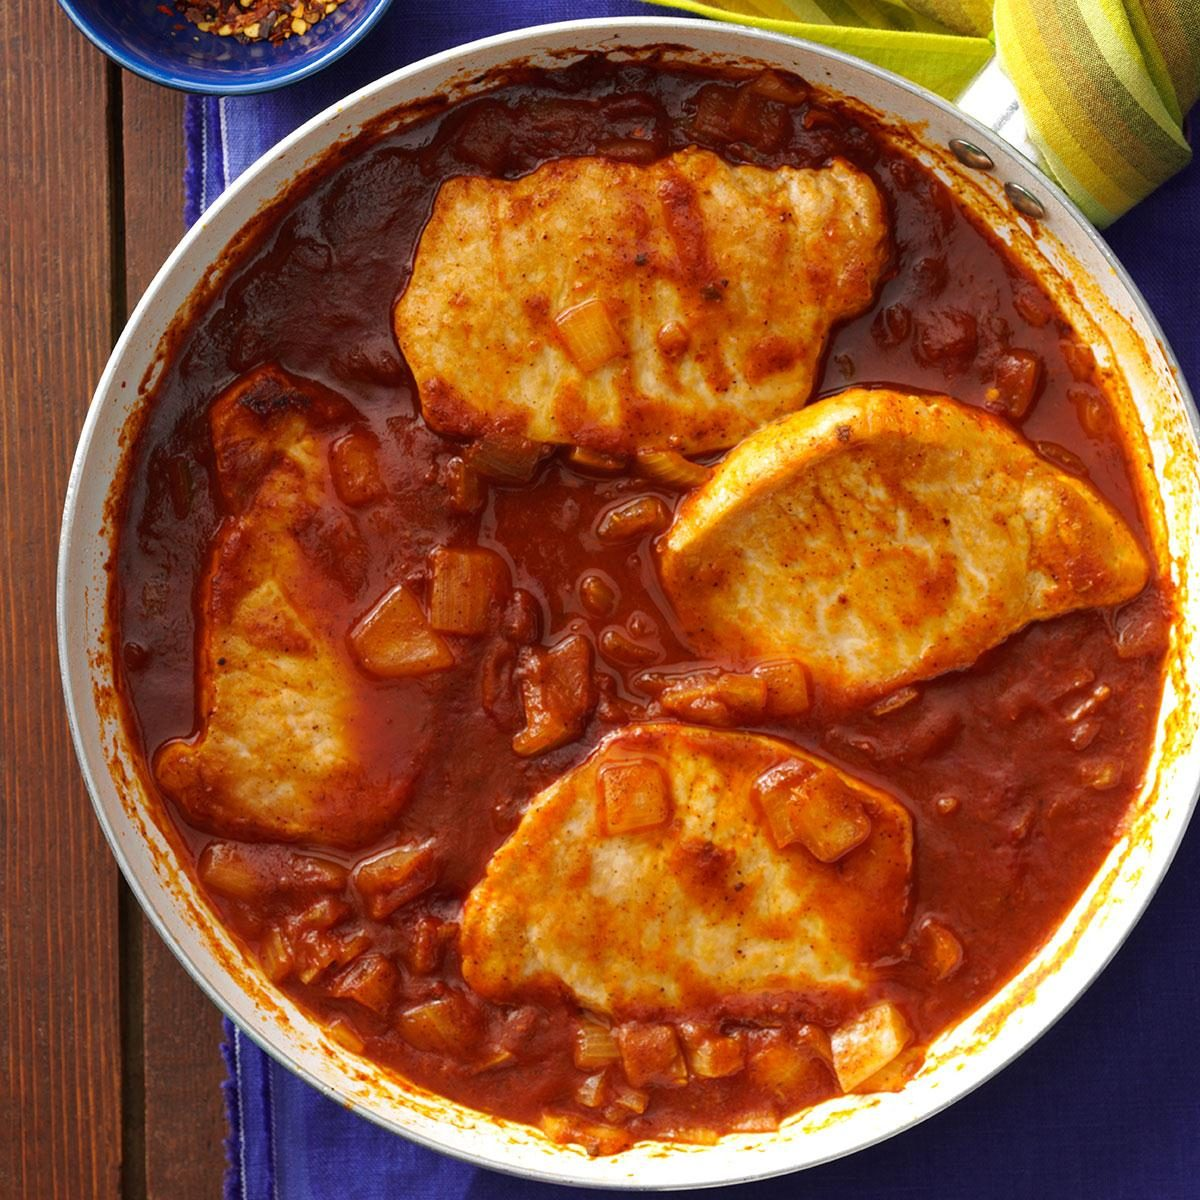 Spicy Tomato Pork Chops Recipe | Taste of Home